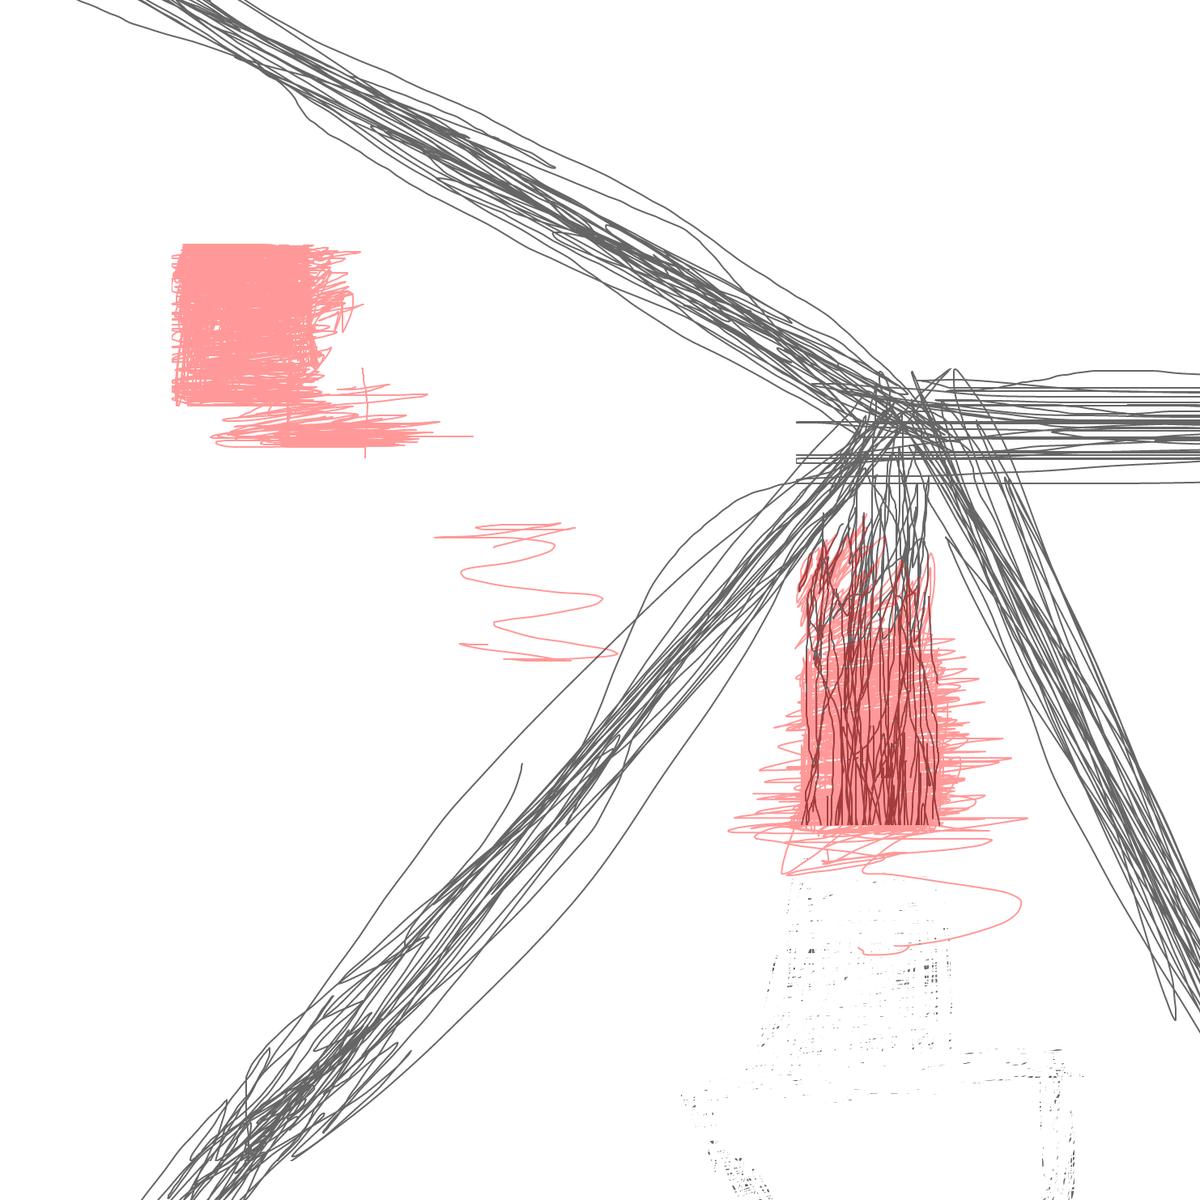 BAAAM drawing#11555 lat:52.4751205444335940lng: 13.4078874588012700